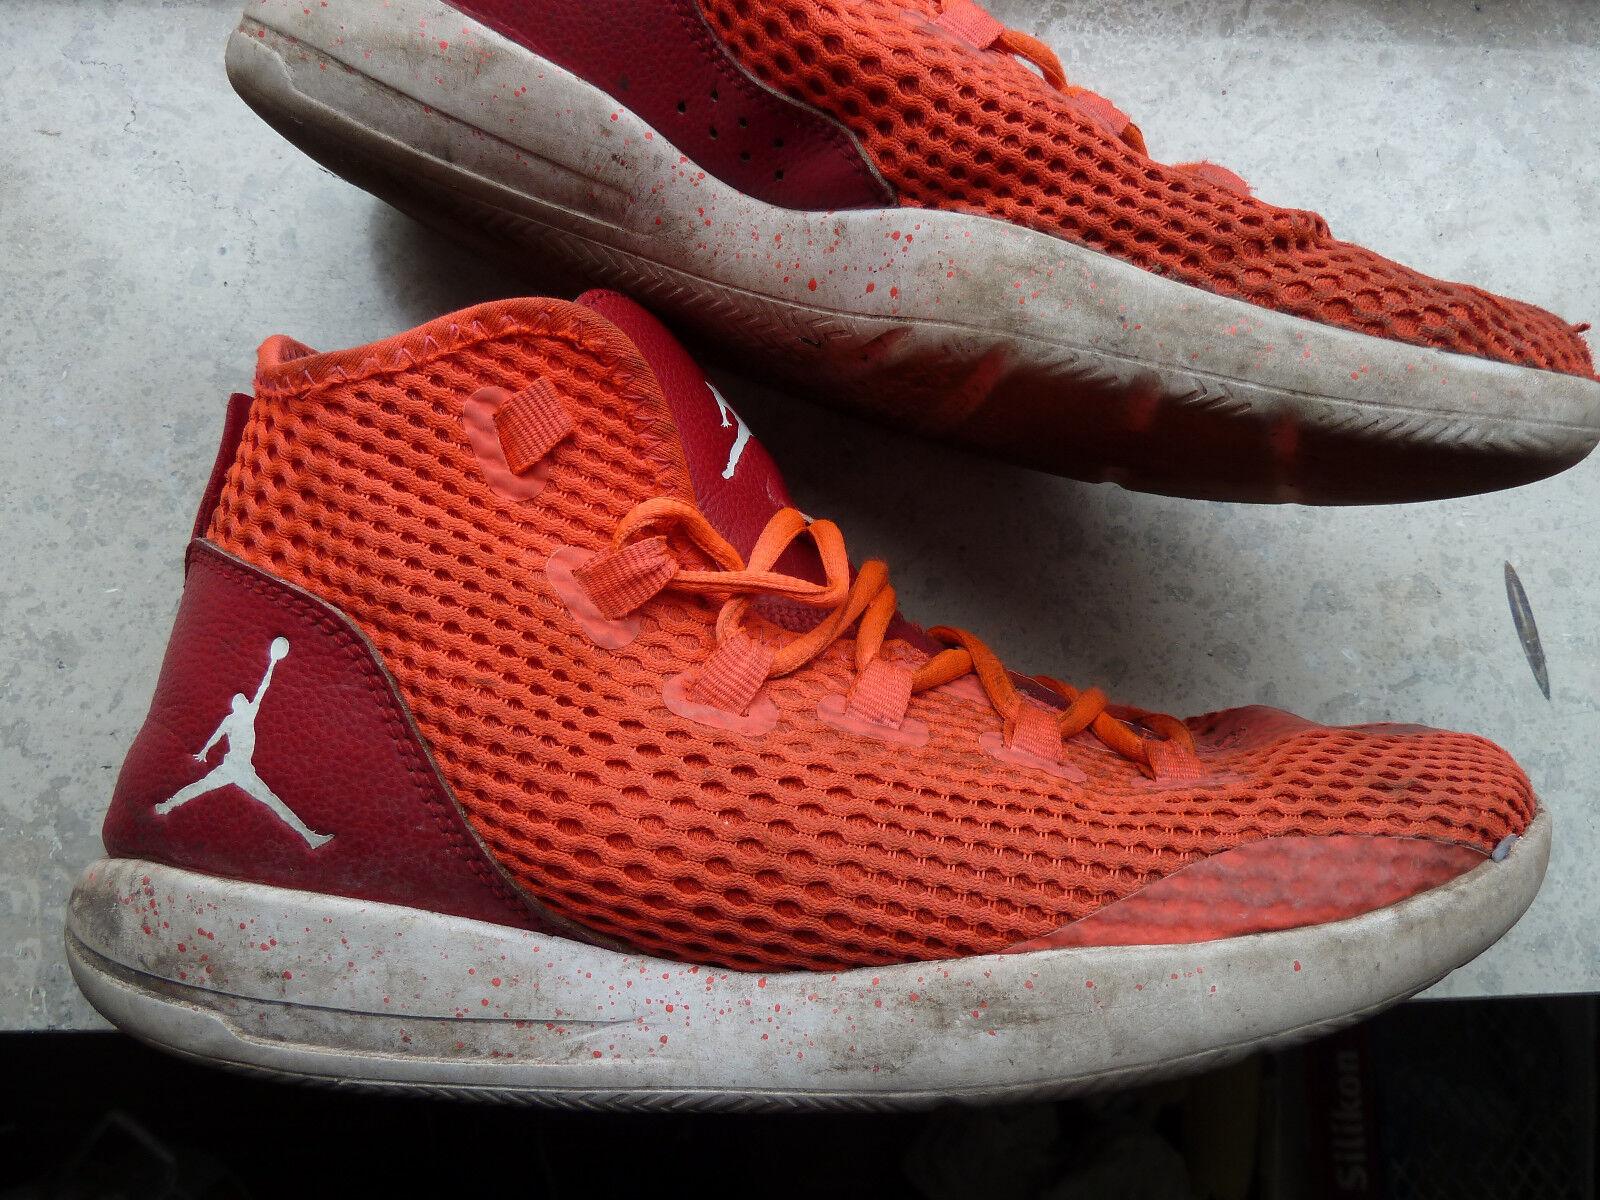 Nike AIR Jordan 23 Reveal InfraROT Gr. 10 44 / US 10 Gr. / 28 cm Nike # 834064-602 7d1aa6